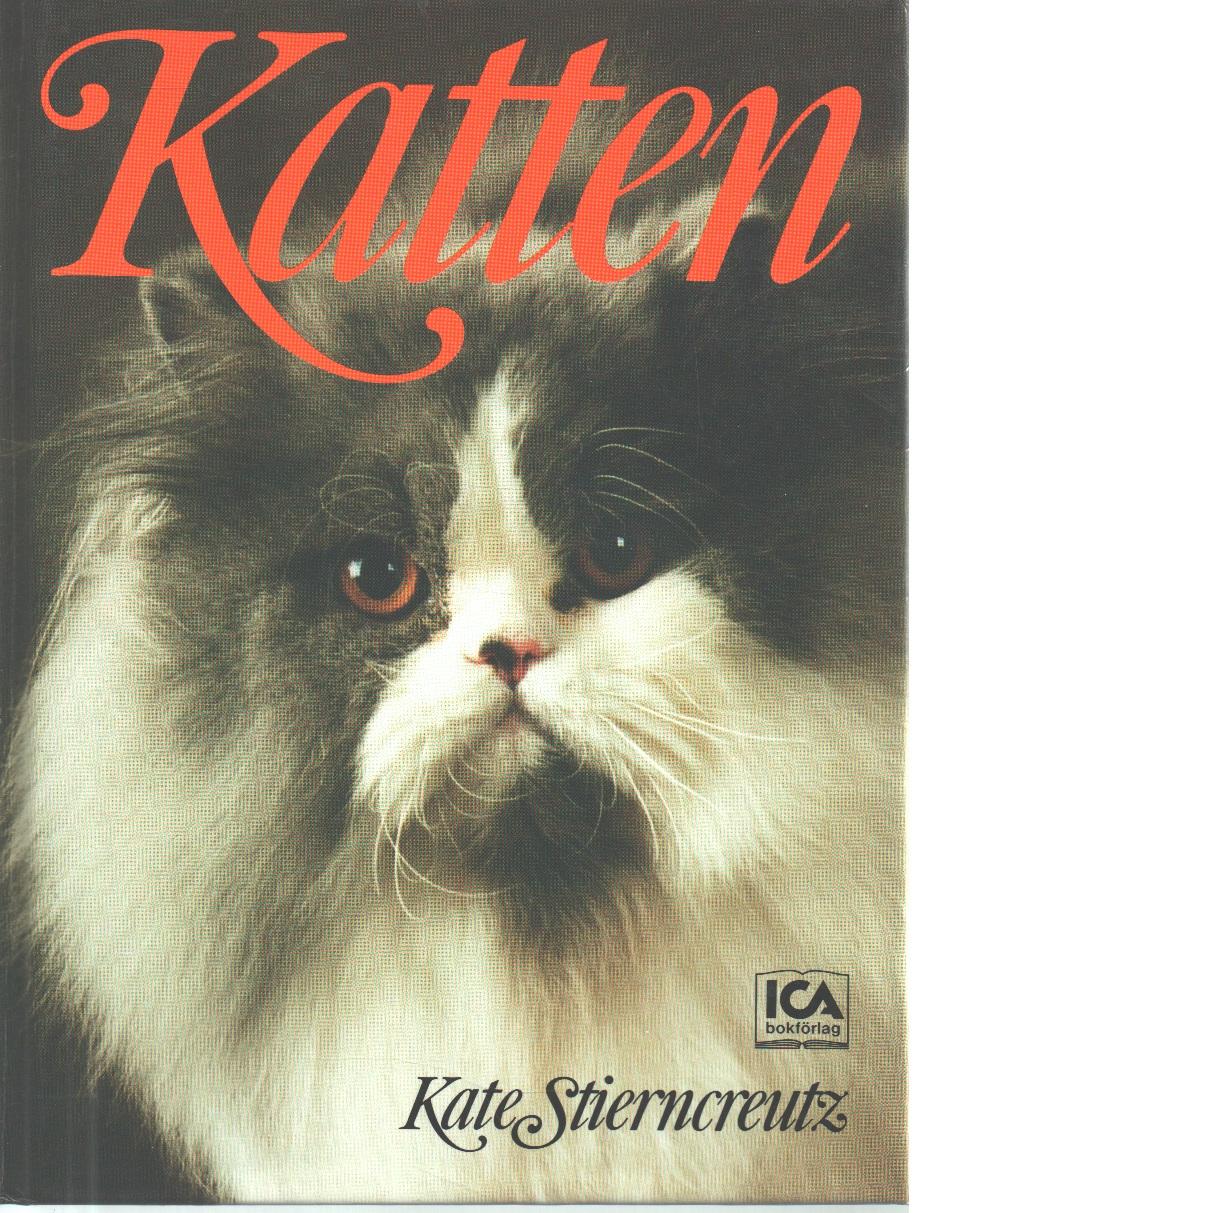 Katten - Stierncreutz, Kate